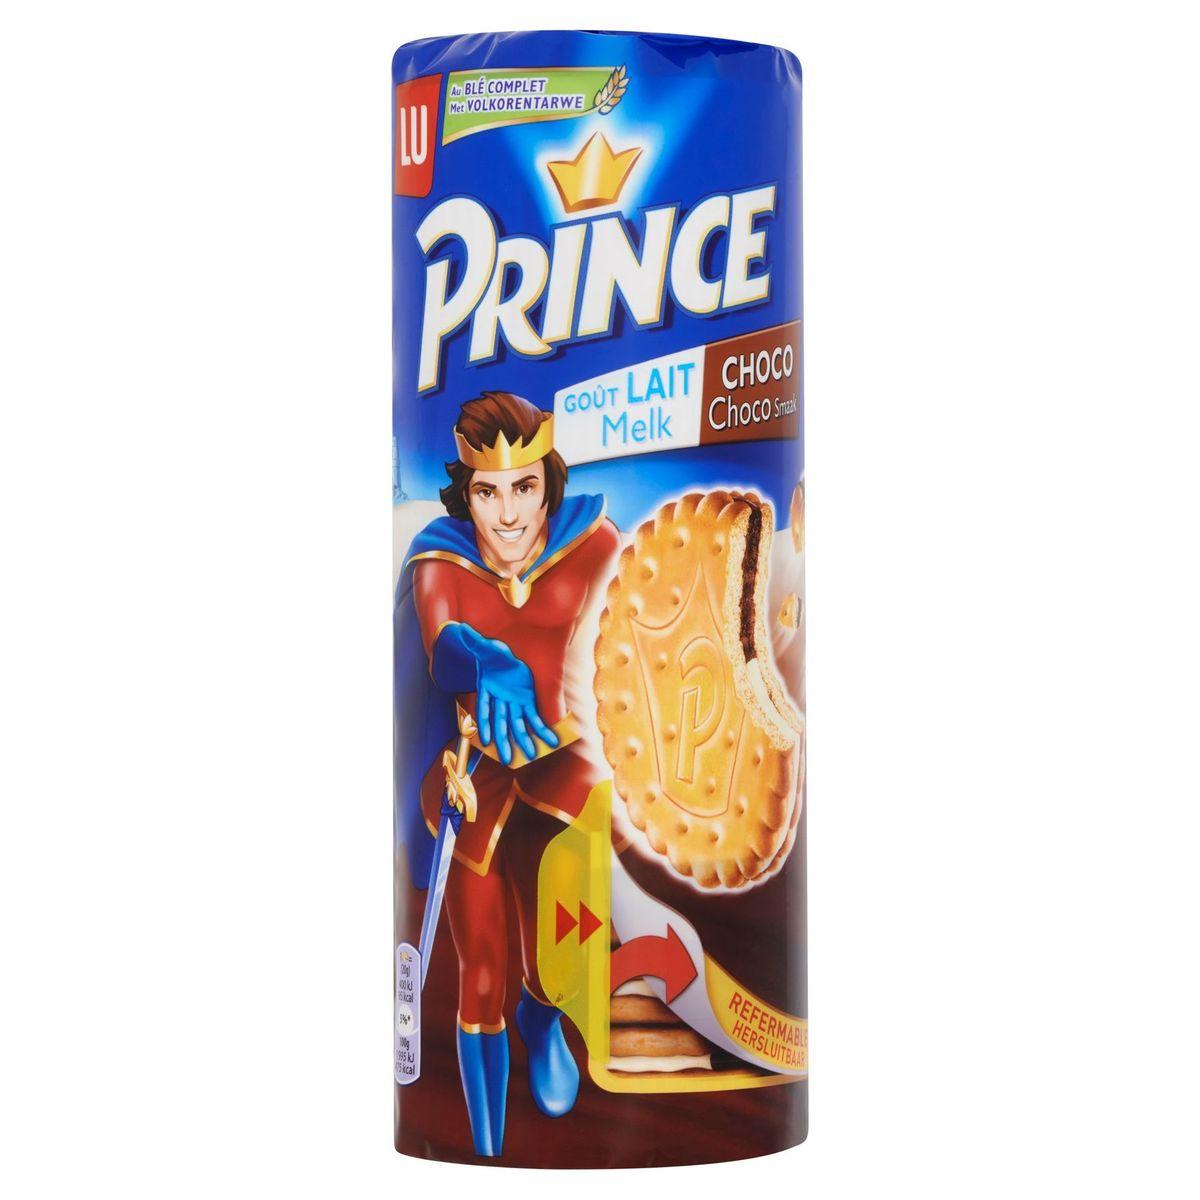 Prince Goût Lait Choco 300 g